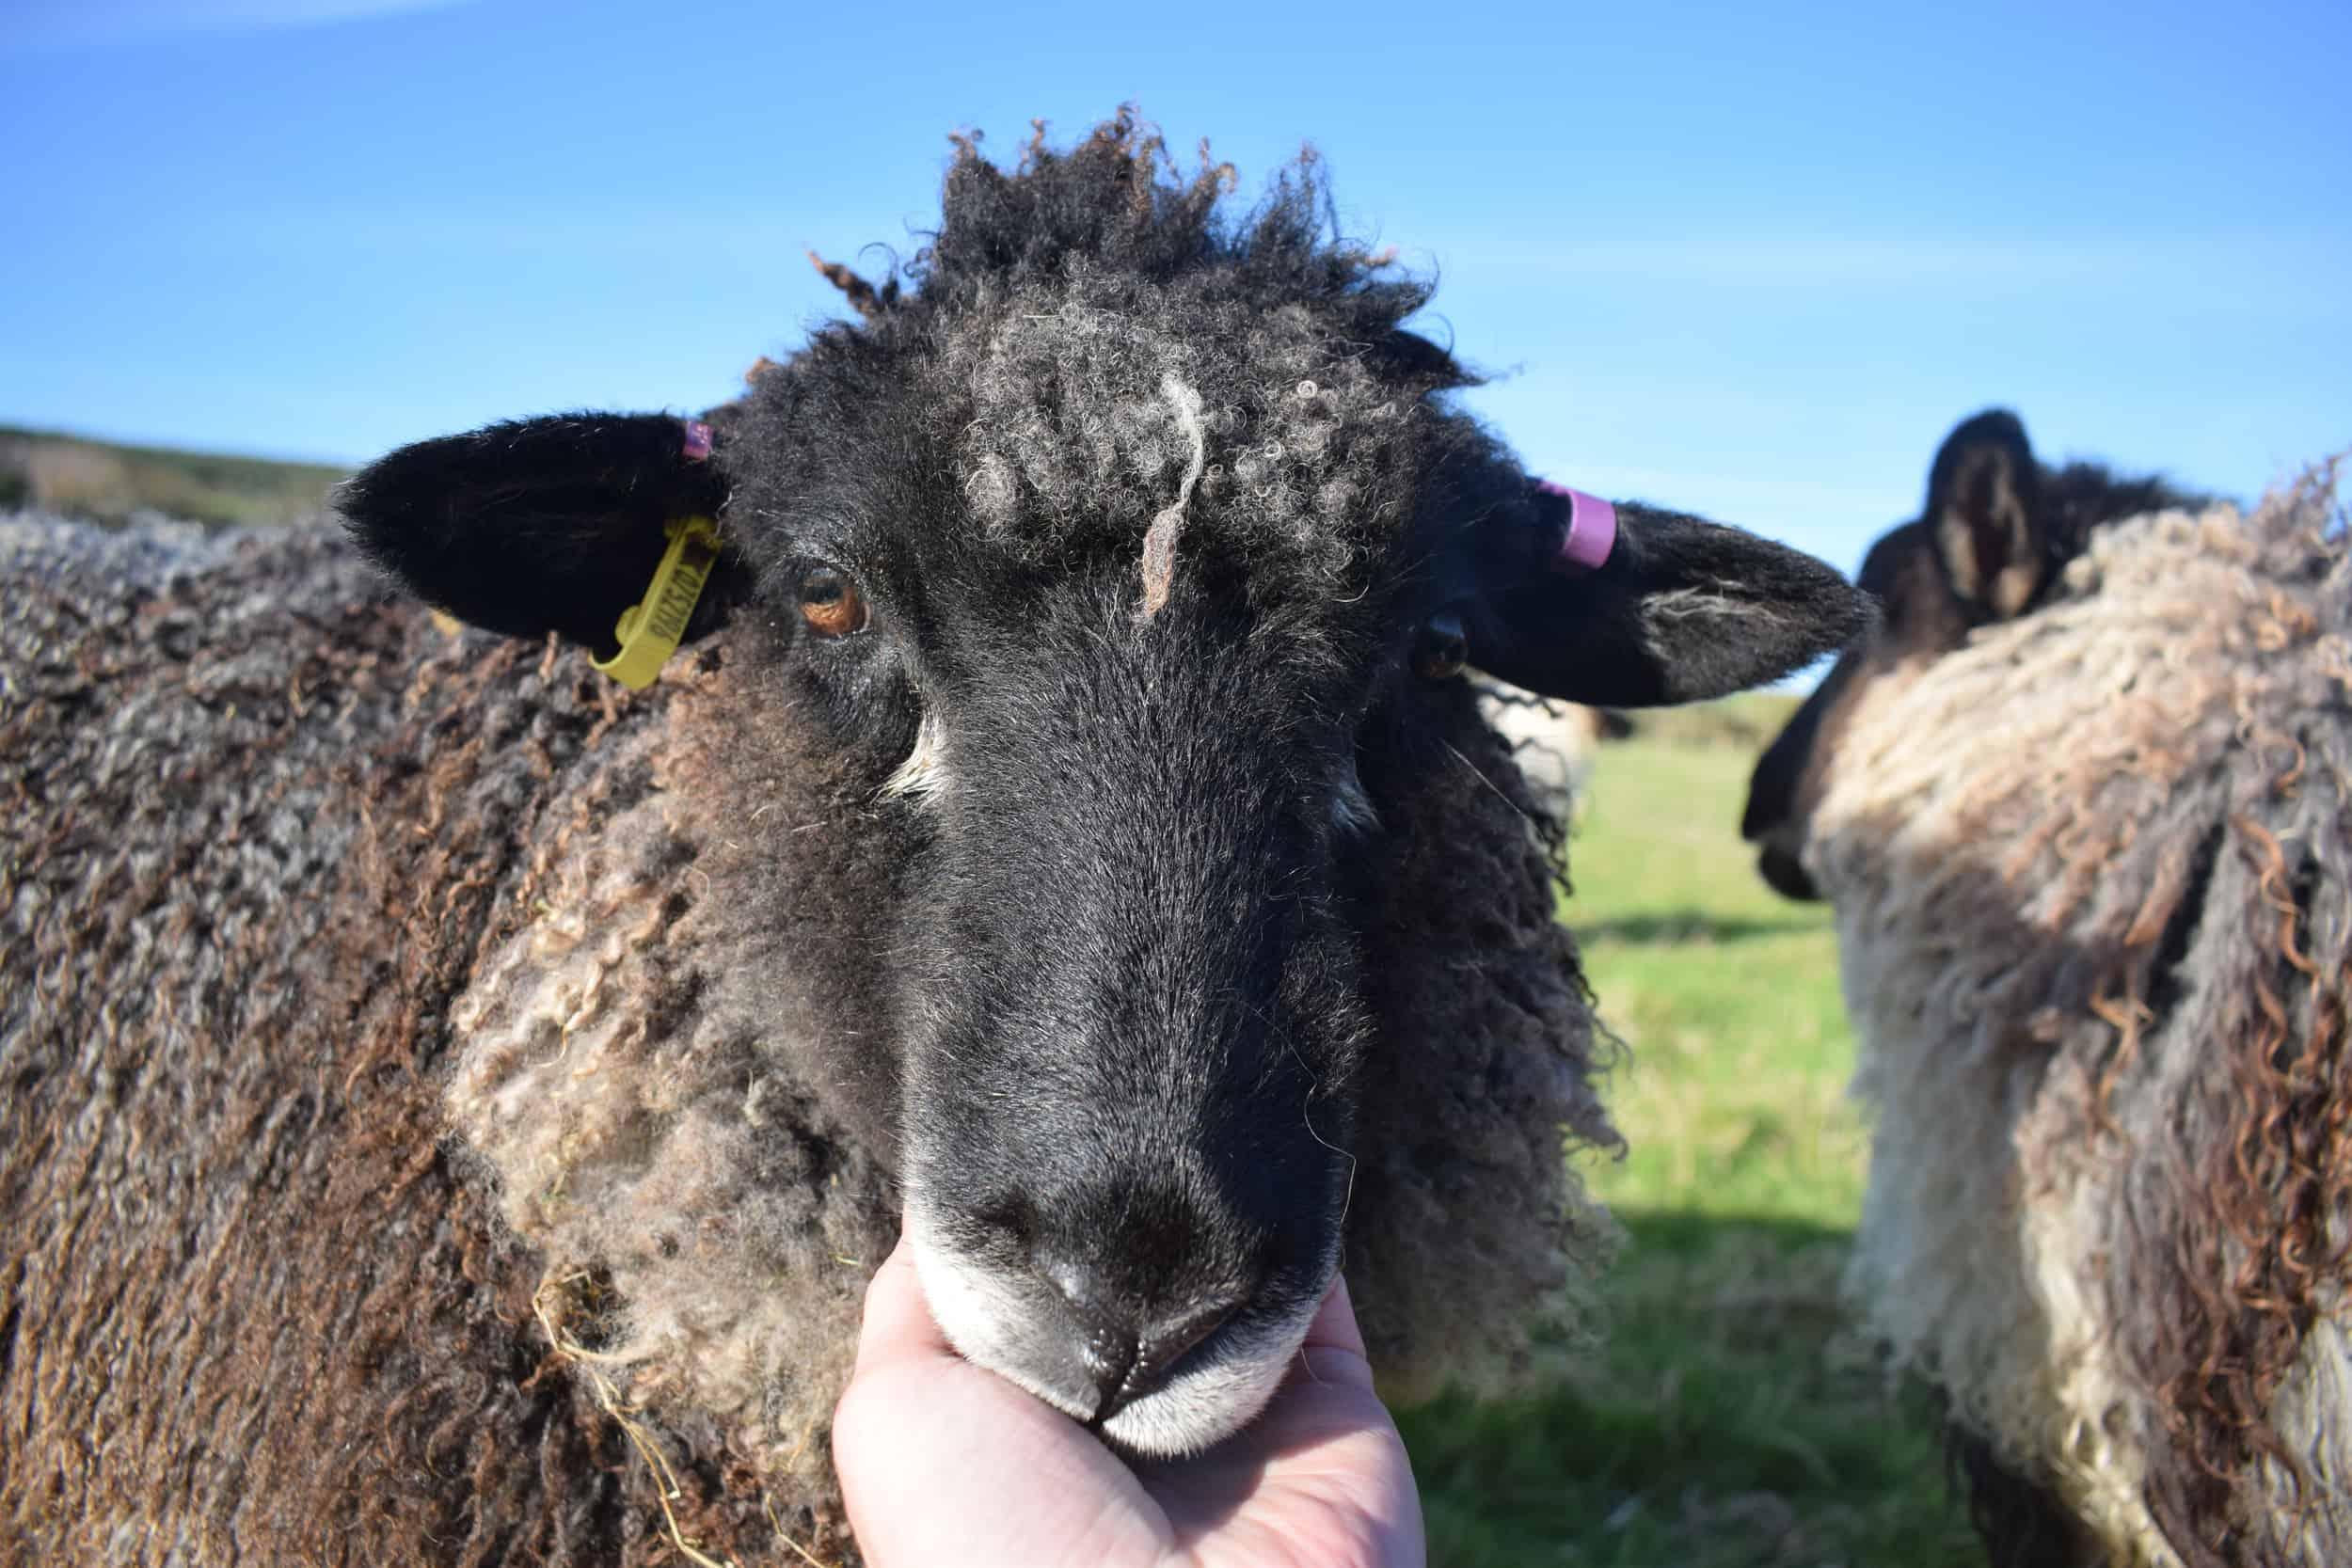 florence coloured leicester longwool gotland shetland sheep crossbreed english blue kind fibre 1